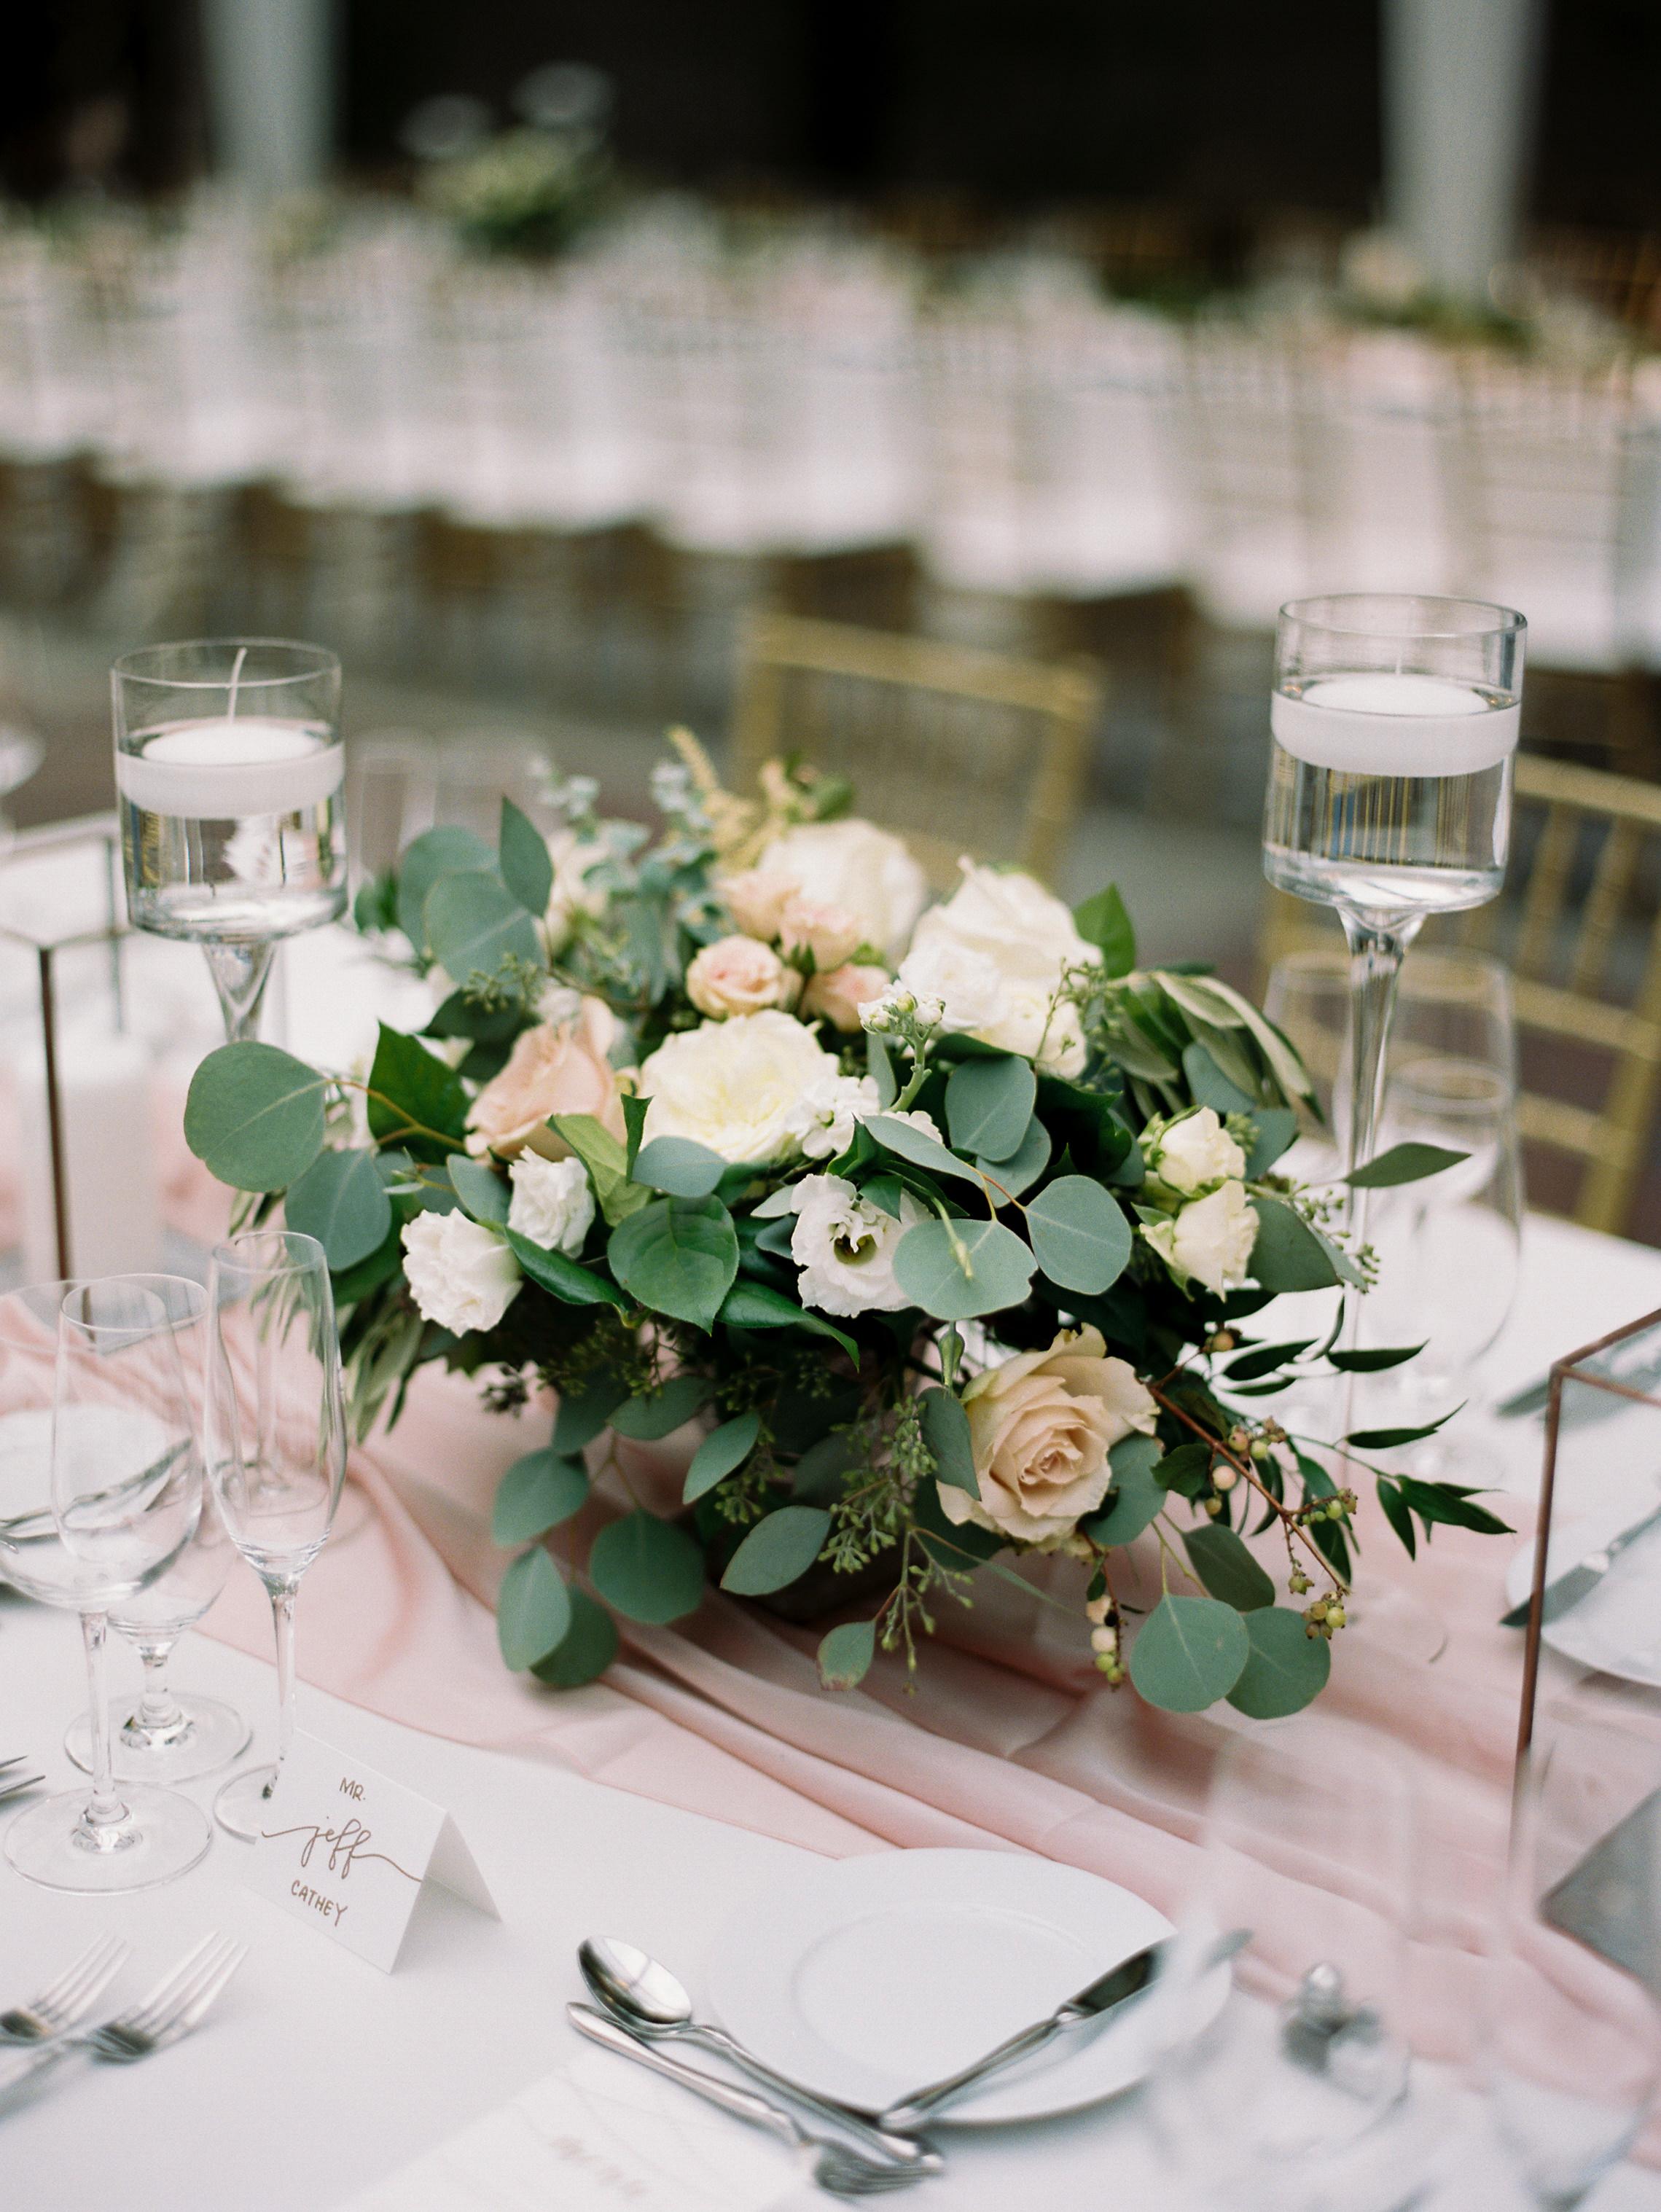 05_jukes_wedding-005.JPG